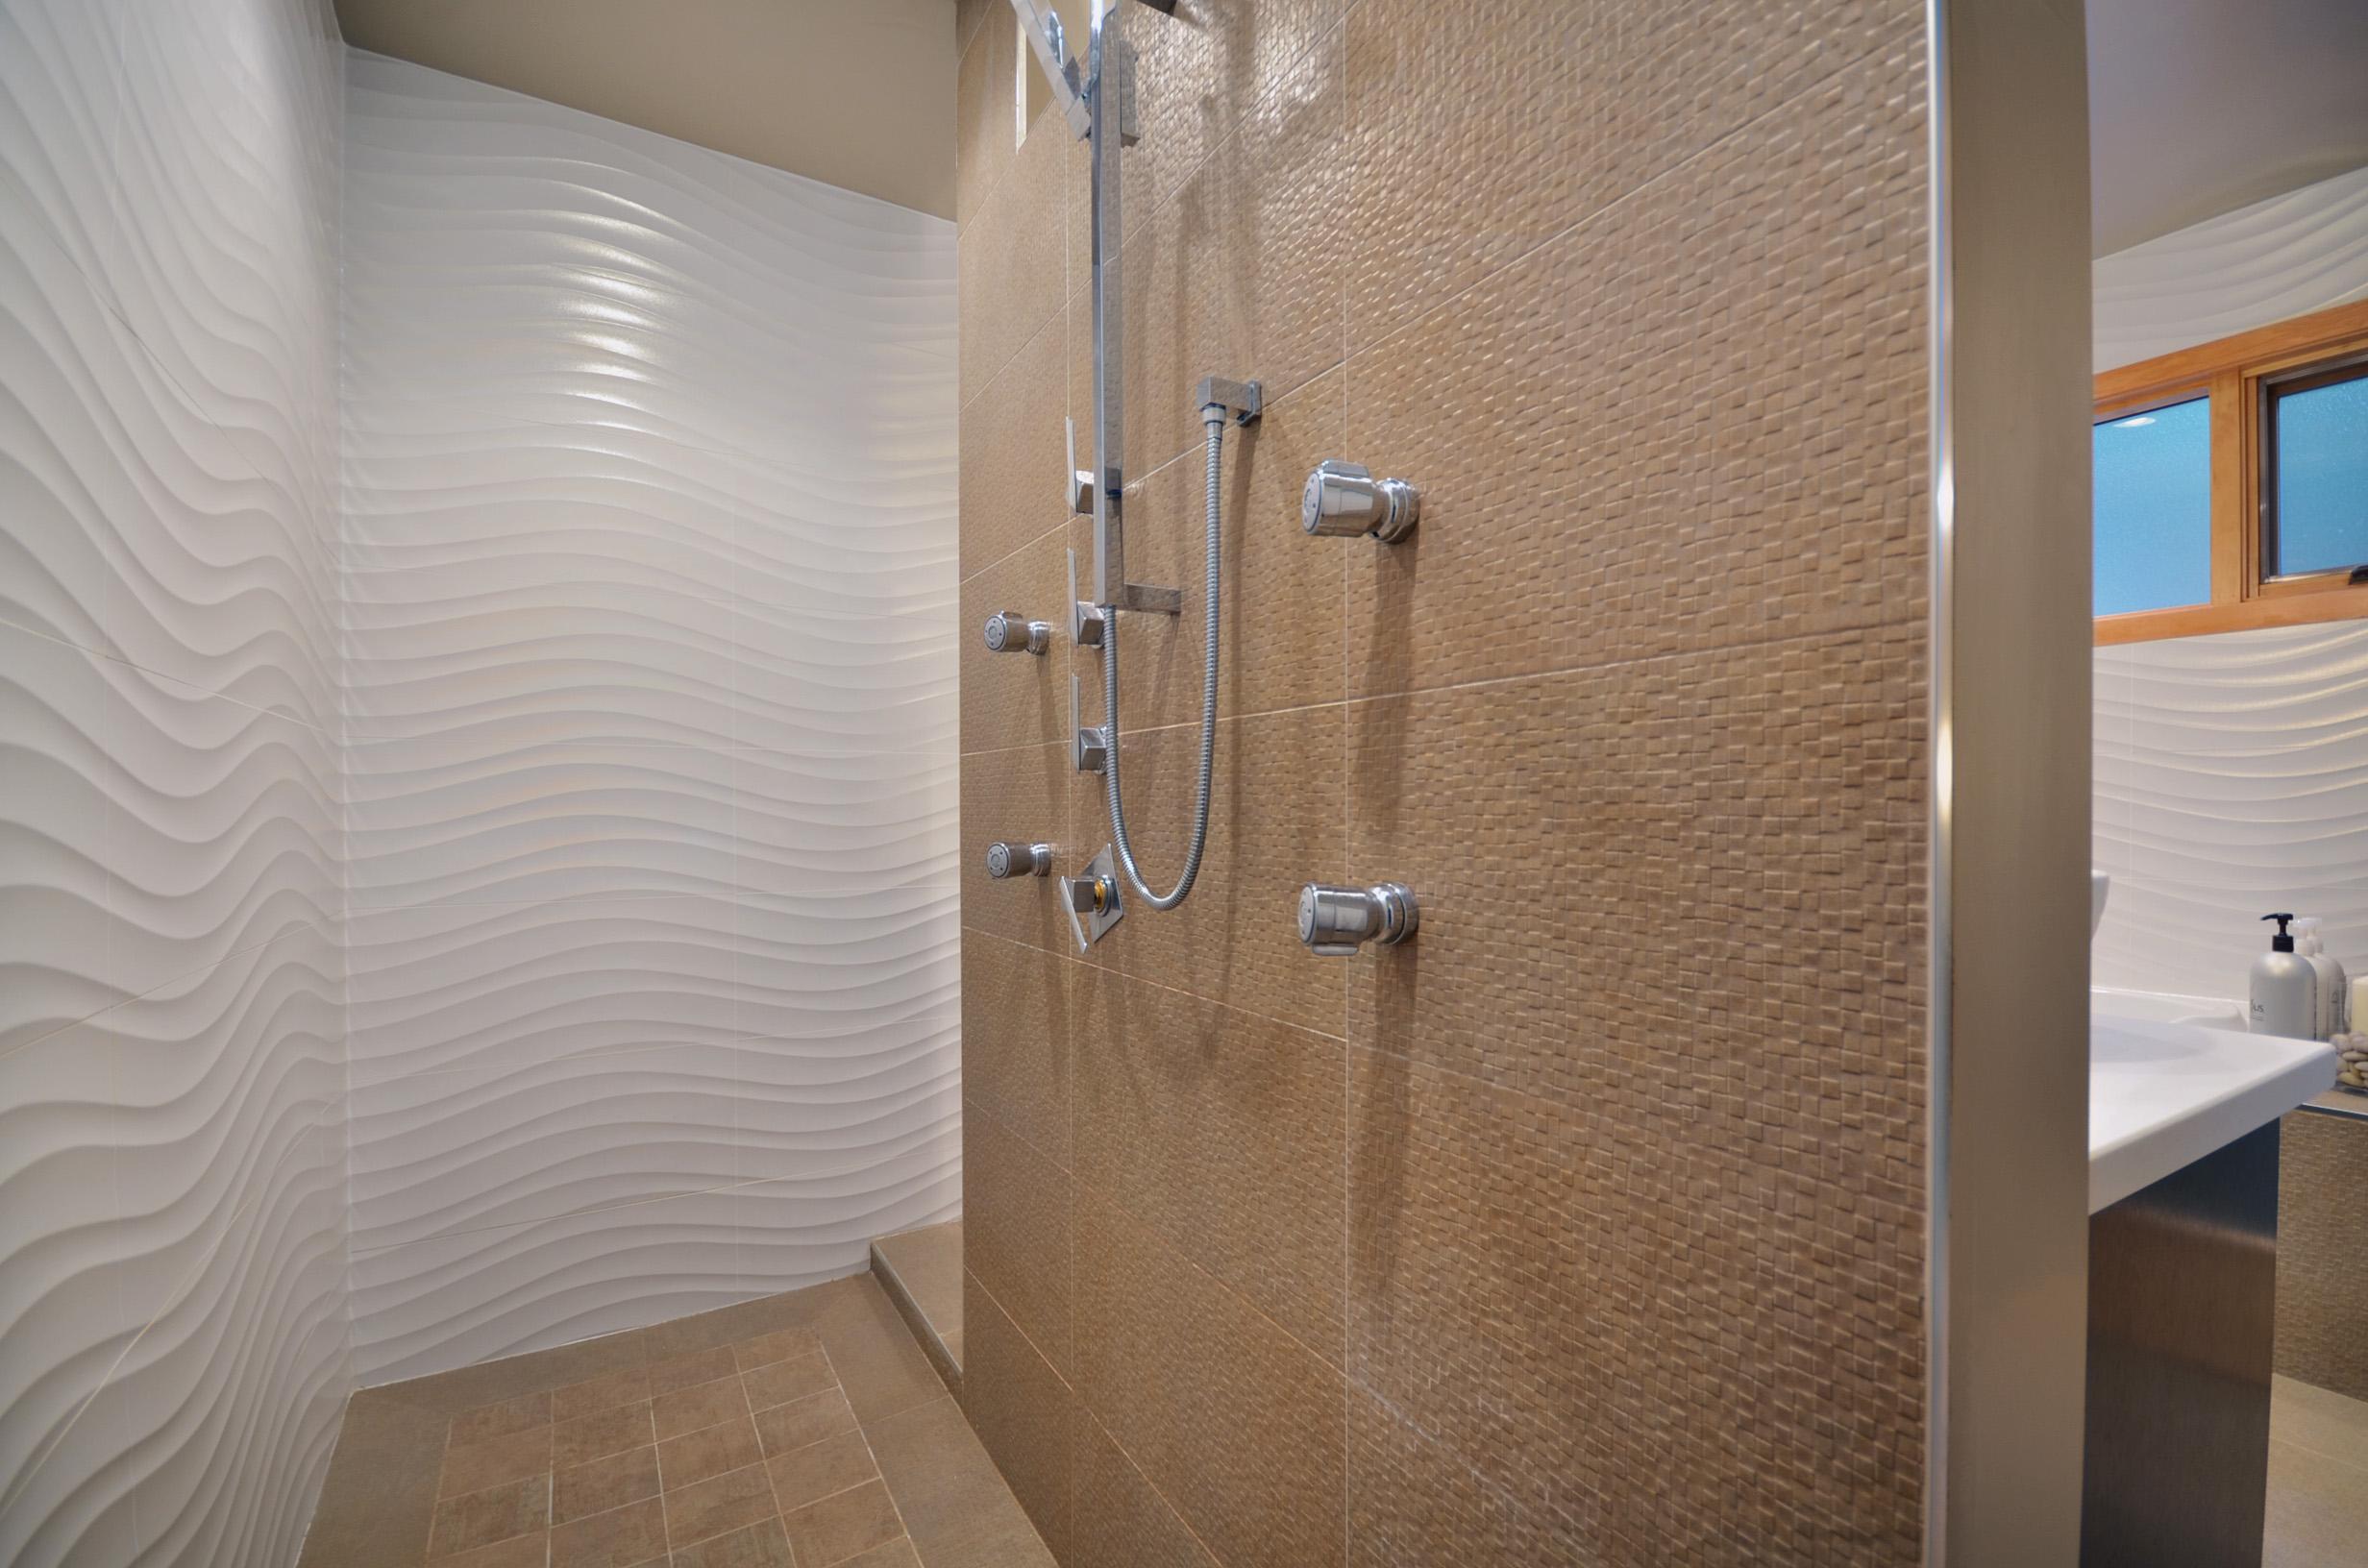 Stunning 10 images walk thru shower house plans 87832 for Walk through shower plans